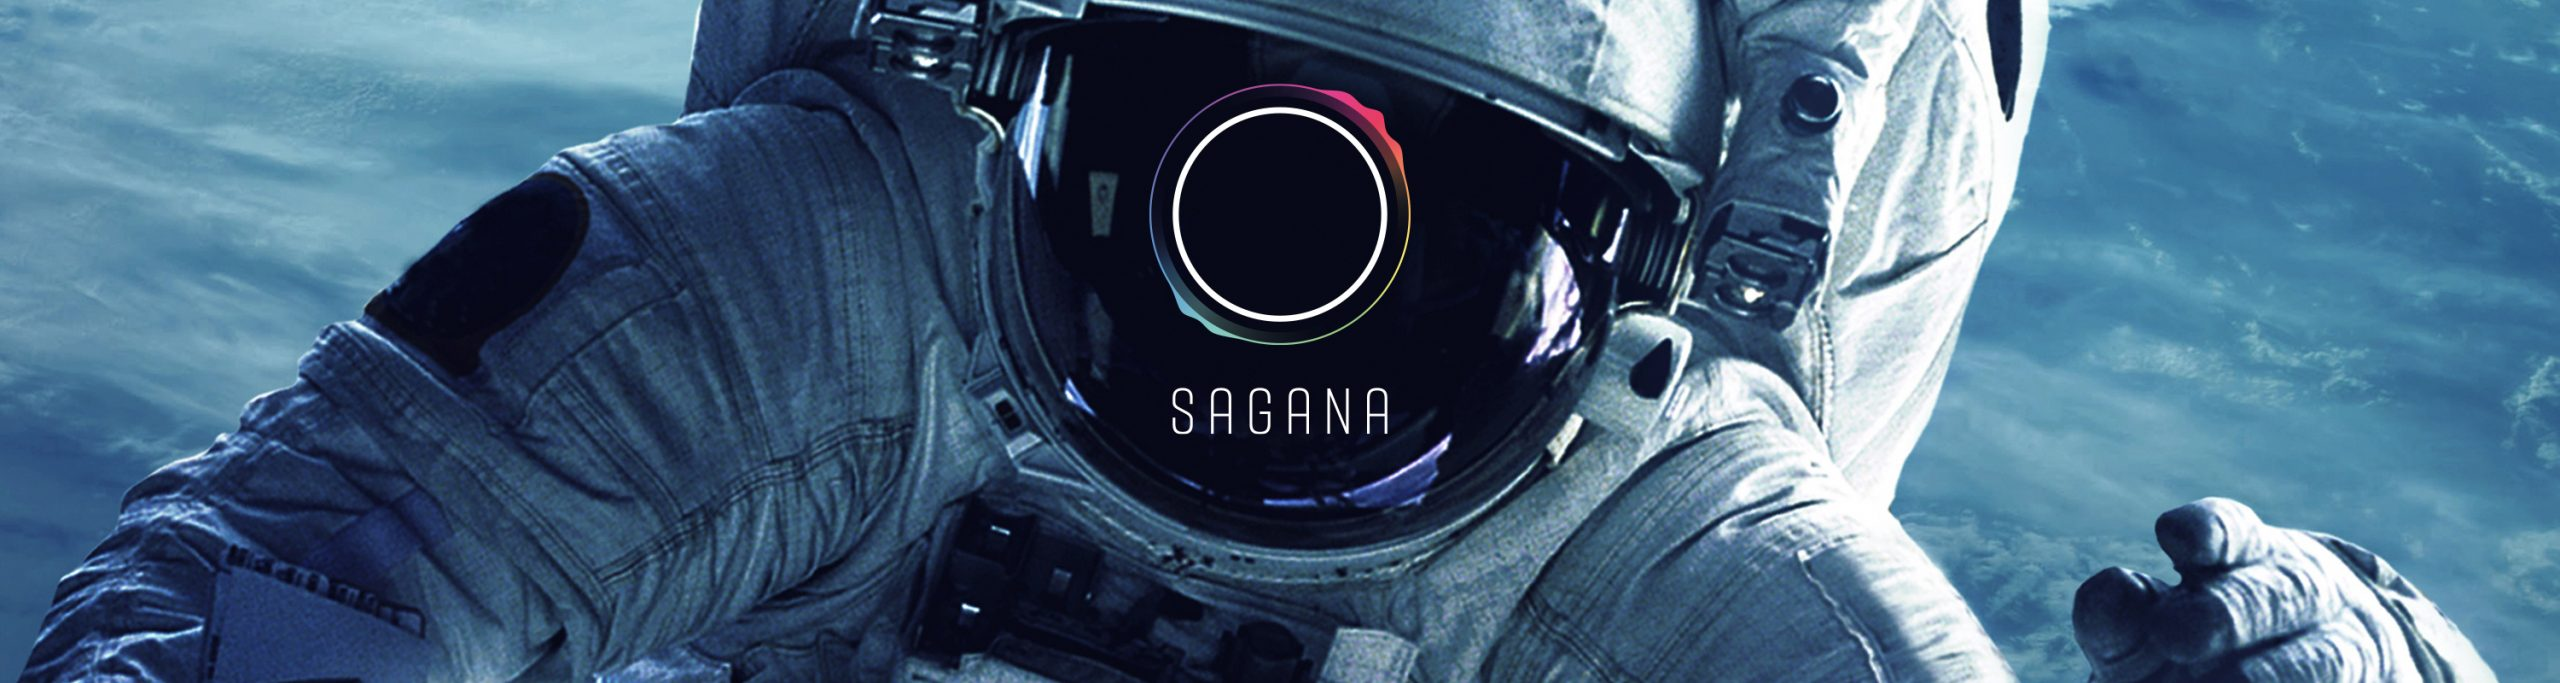 Sagana_impact_Start_by_majormajor